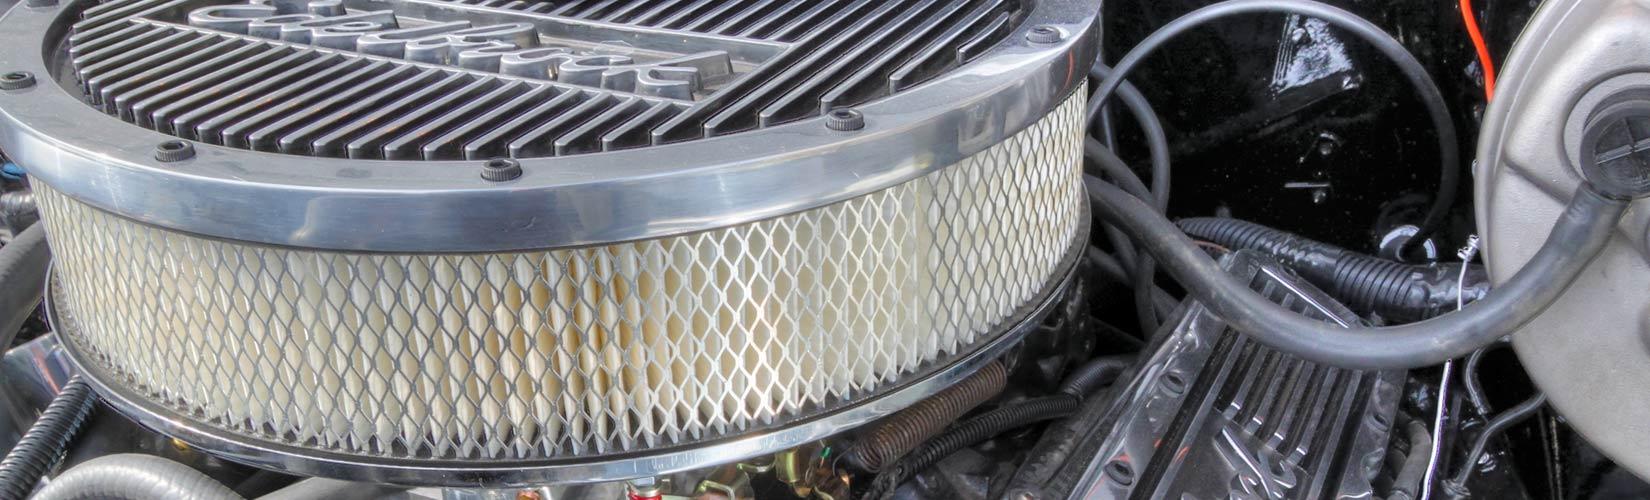 V3 44 Louisville Ky Jeep Restoration Repair Shop Cj5 Frame 4x4